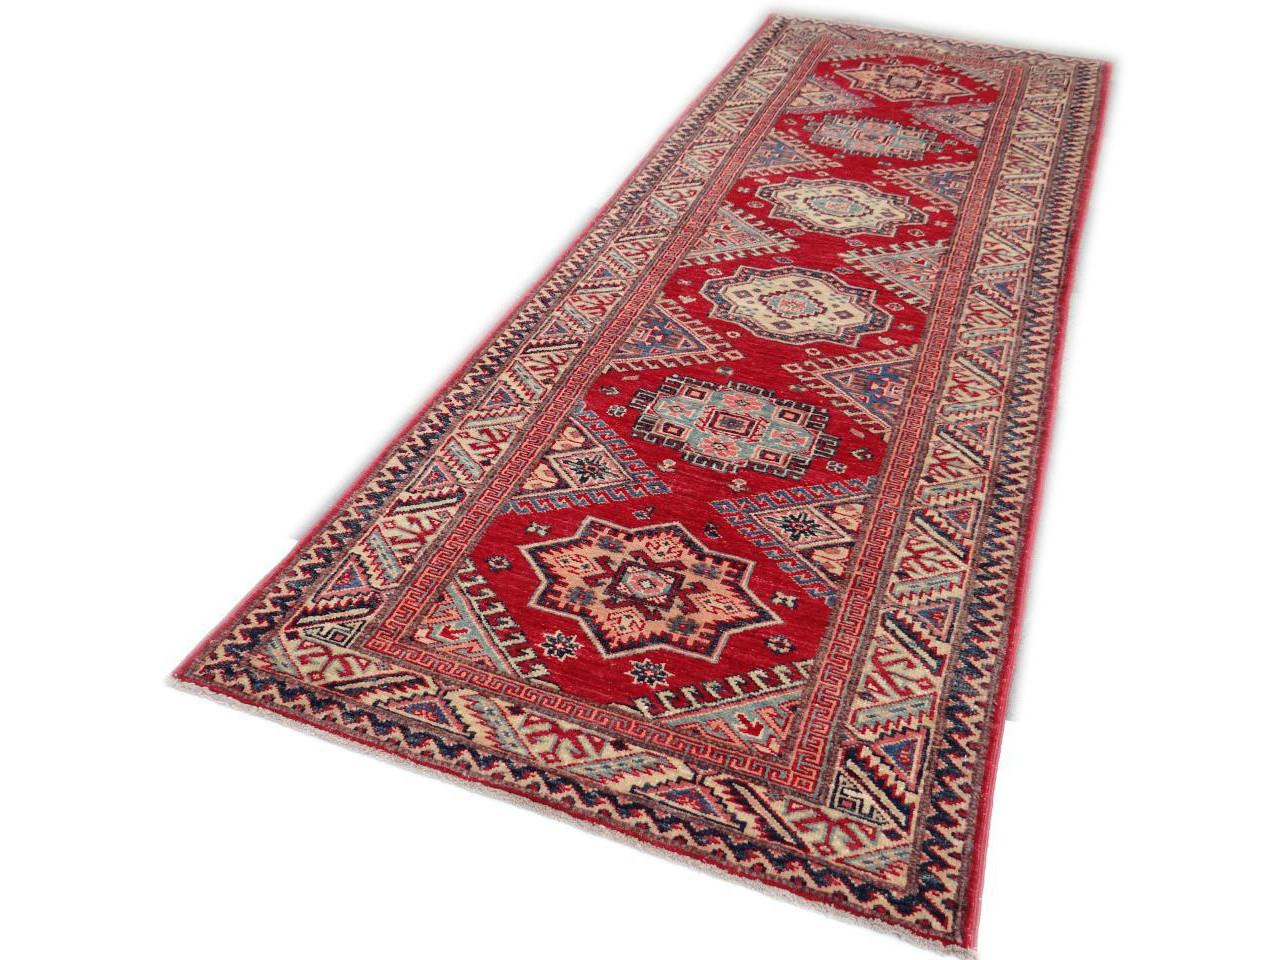 ghazni fin tapis ghazni kazak n 2457 222x80cm. Black Bedroom Furniture Sets. Home Design Ideas